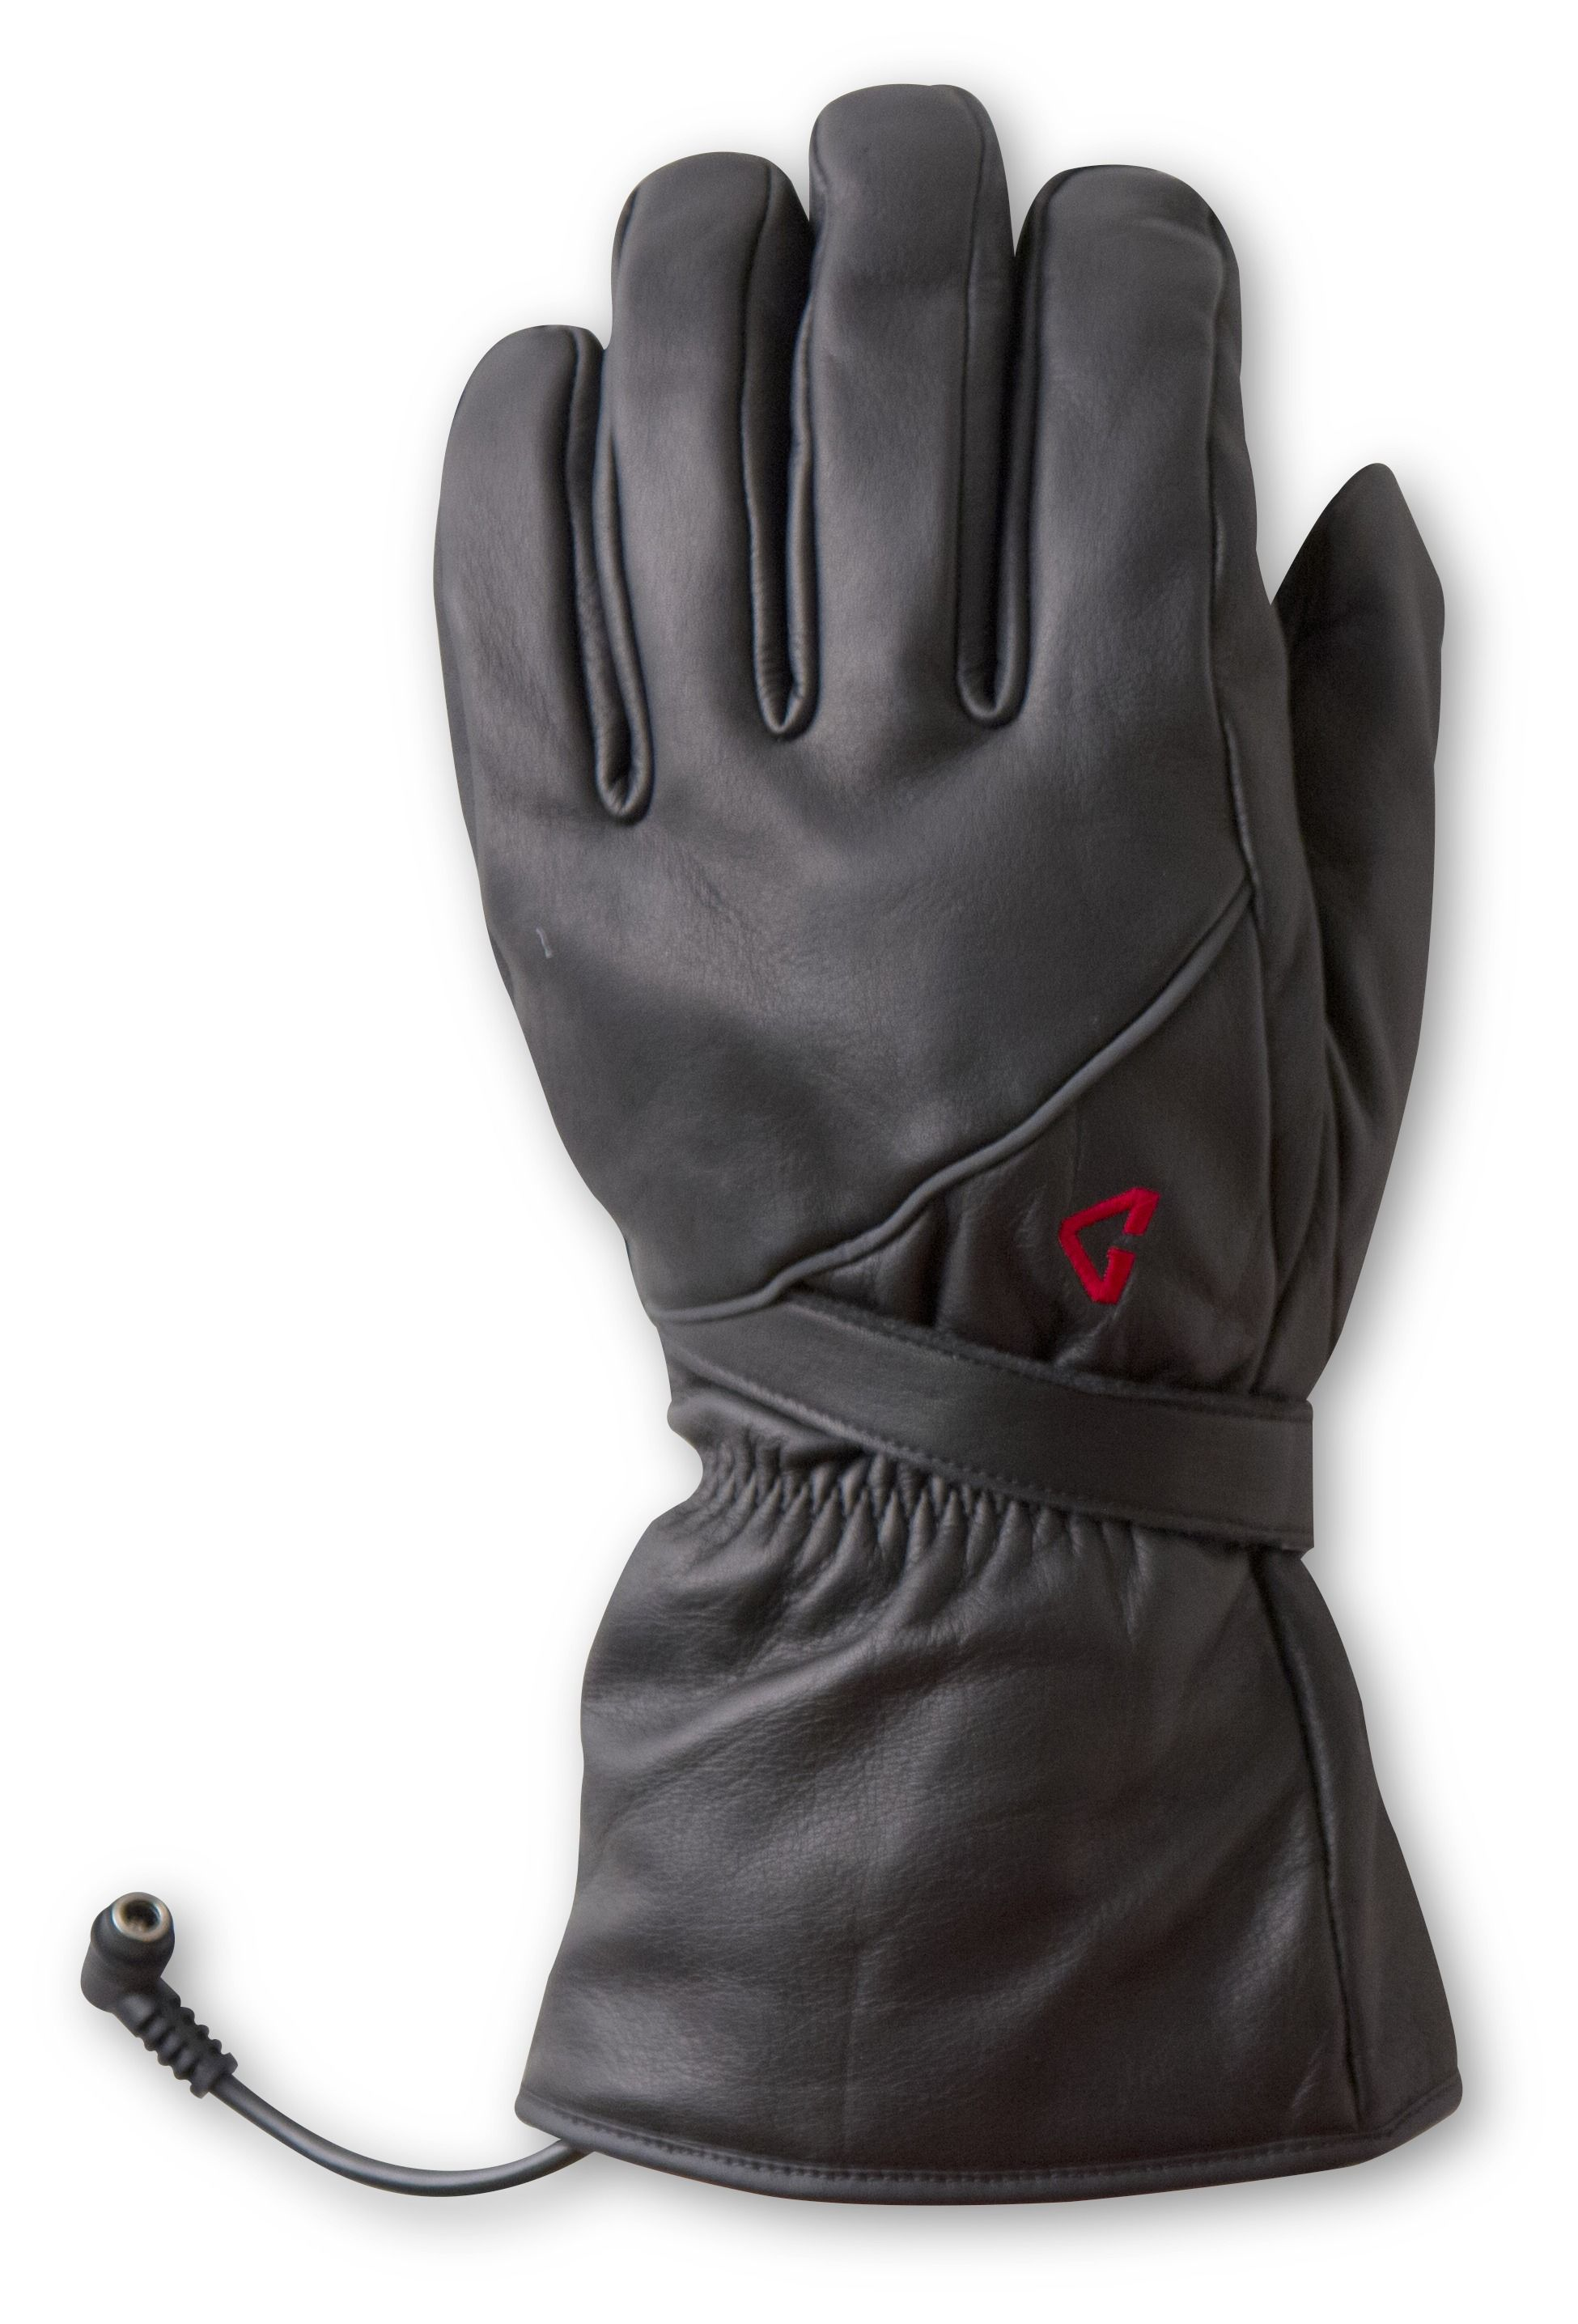 Justin leather work gloves - Justin Leather Work Gloves 26